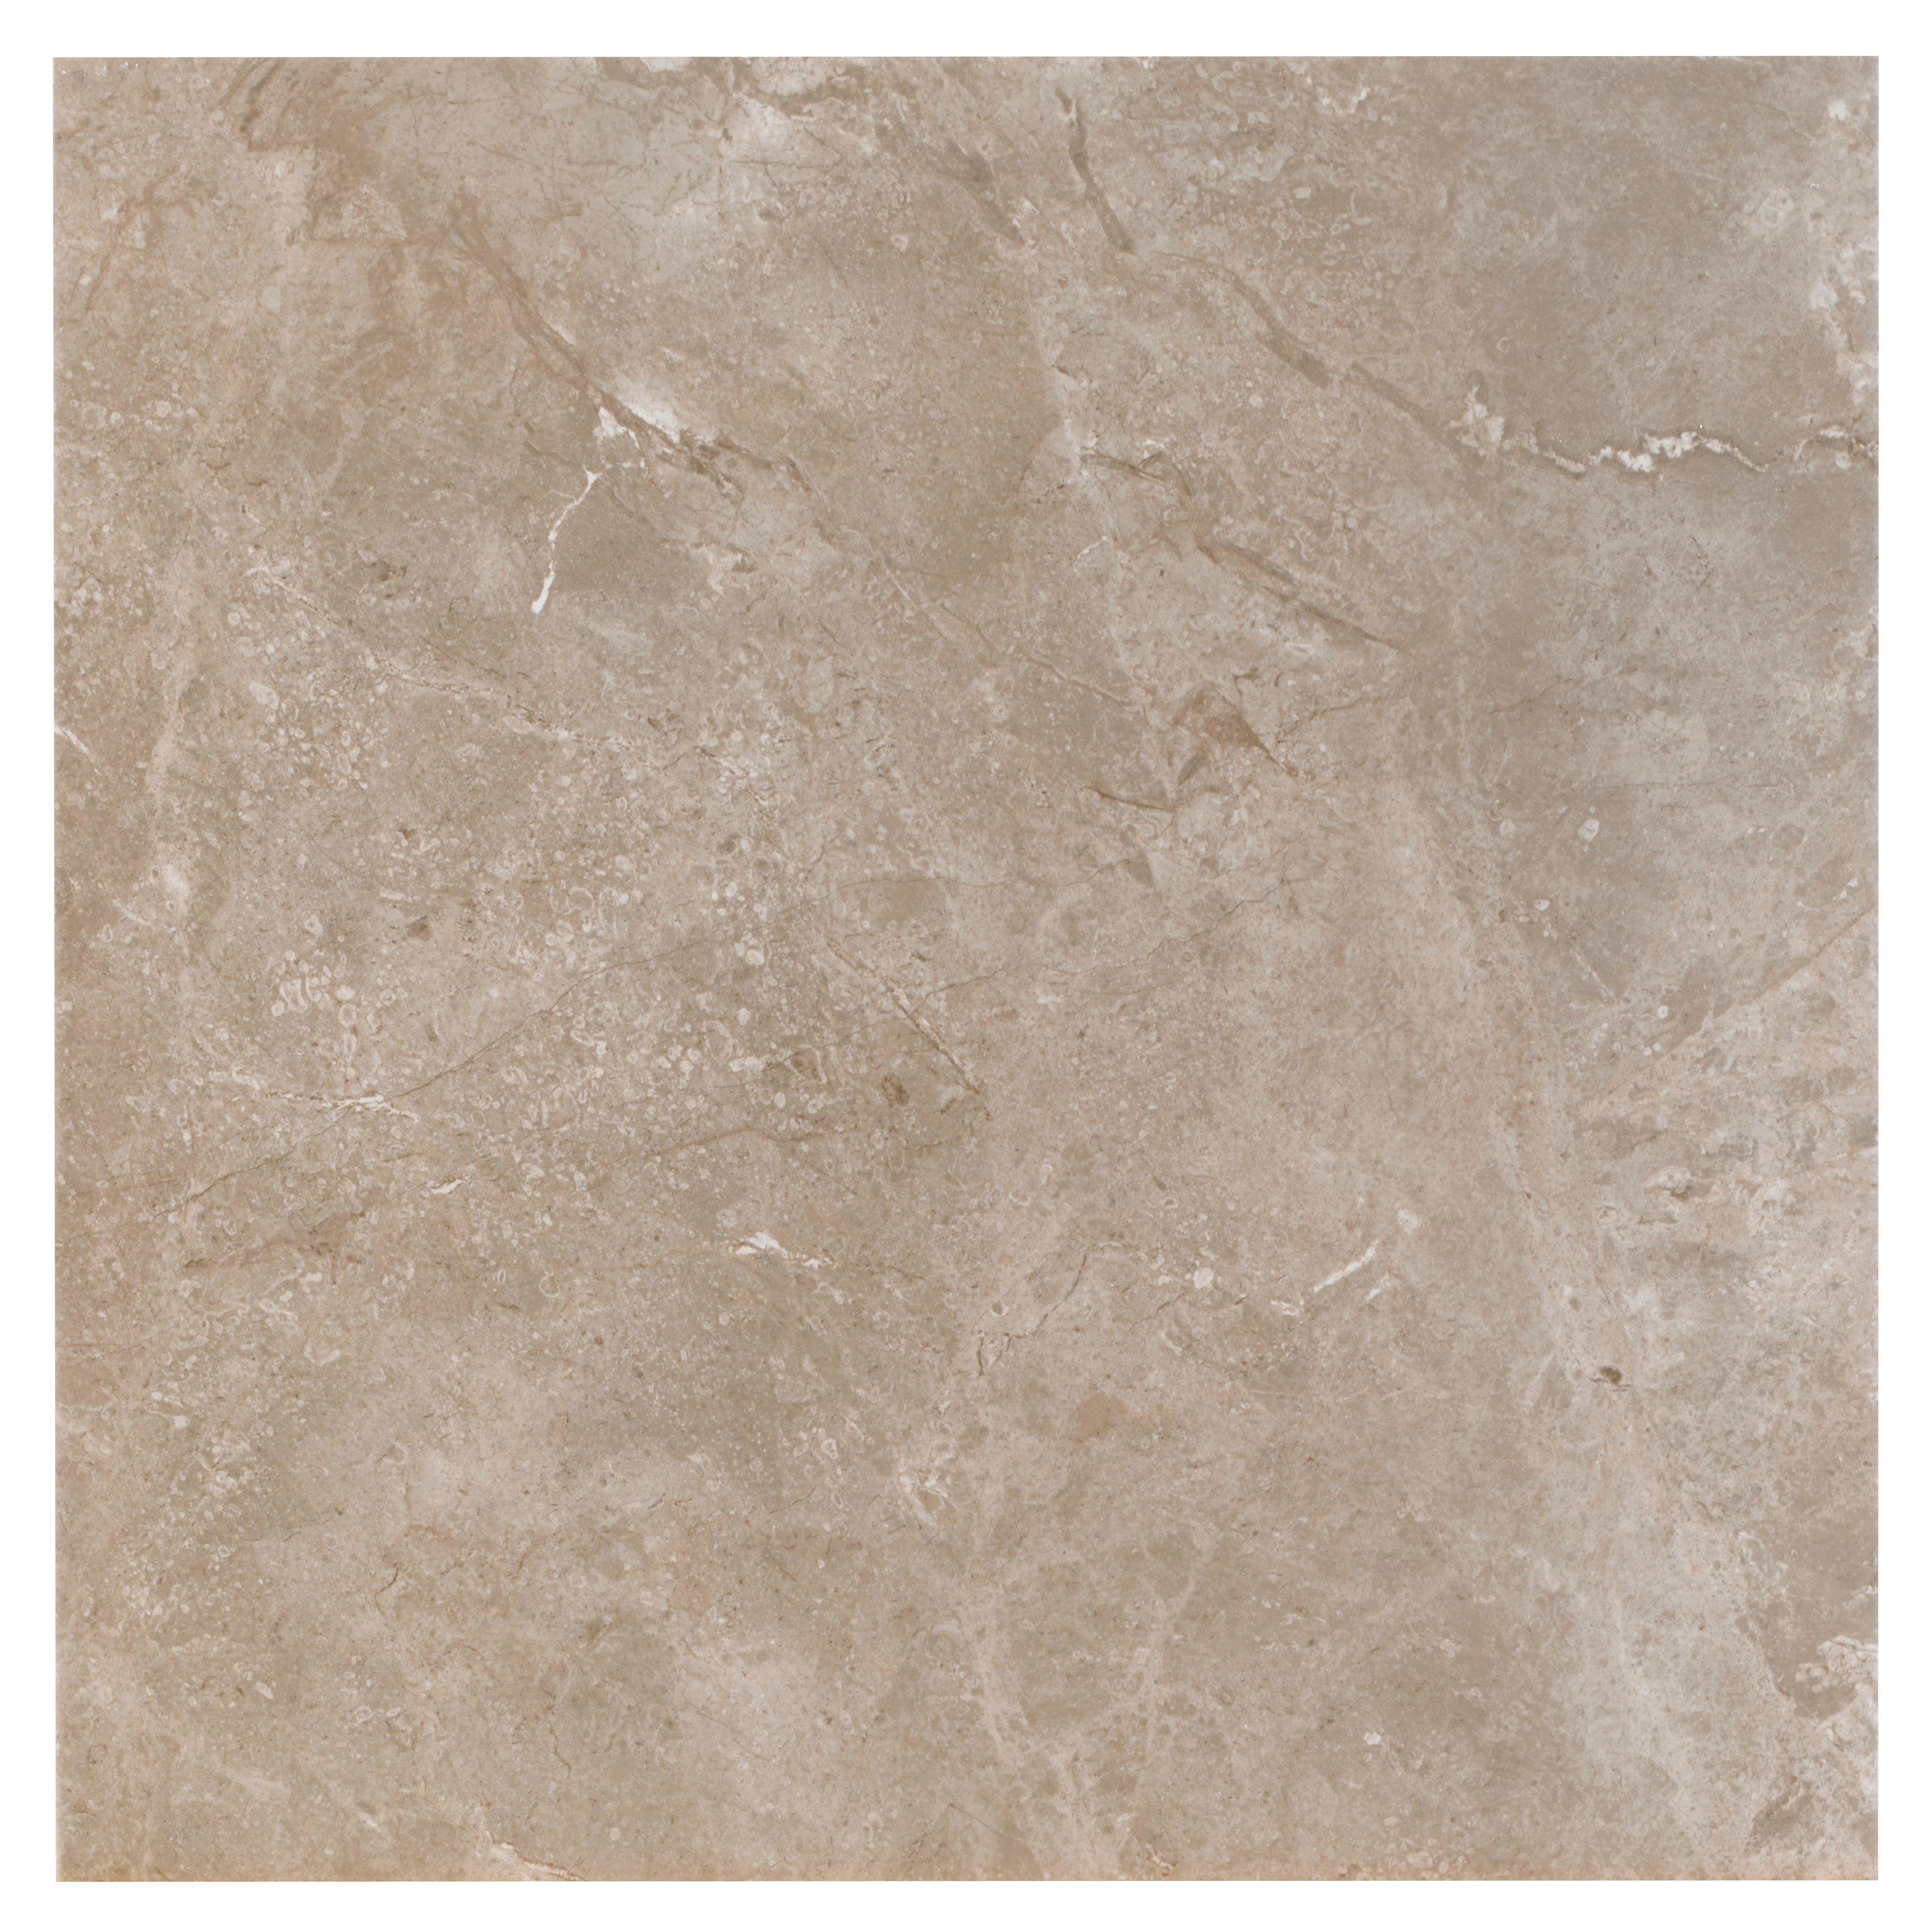 Burlington earth stone effect ceramic wall floor tile pack of 4 burlington earth stone effect ceramic wall floor tile pack of 4 l498mm w498mm dailygadgetfo Choice Image